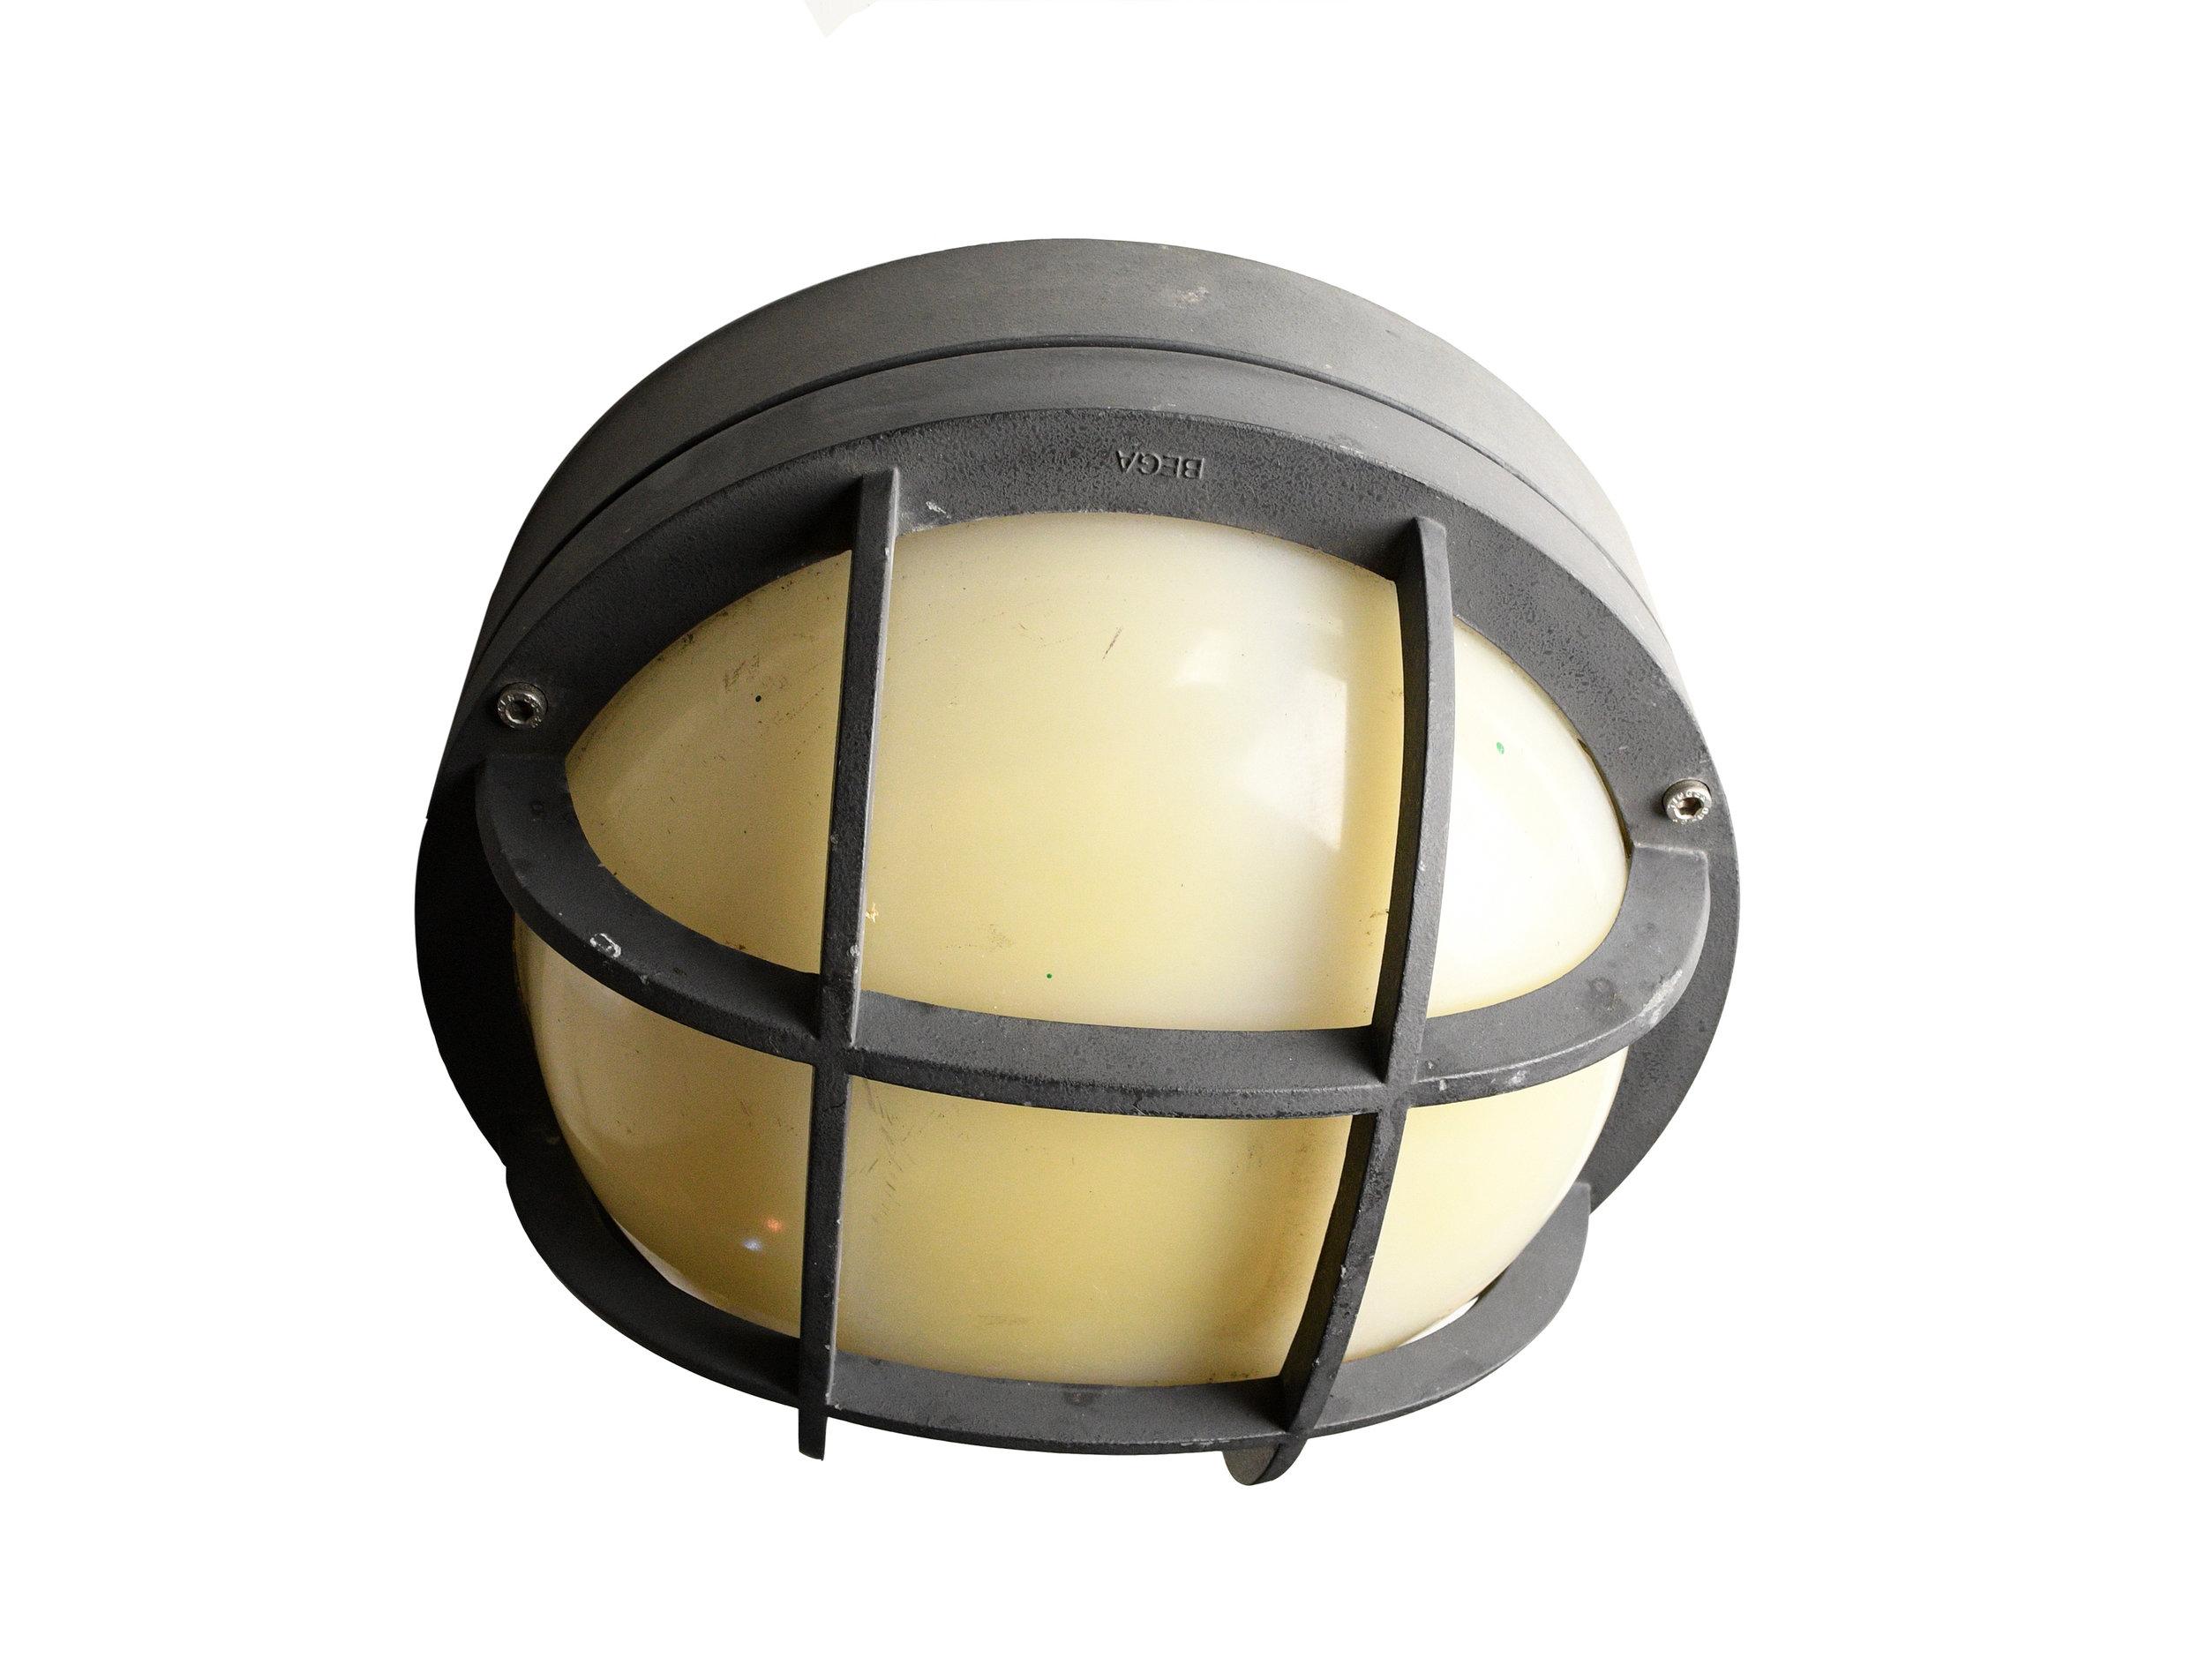 47847-wall-mount-nautical-light-1.jpg